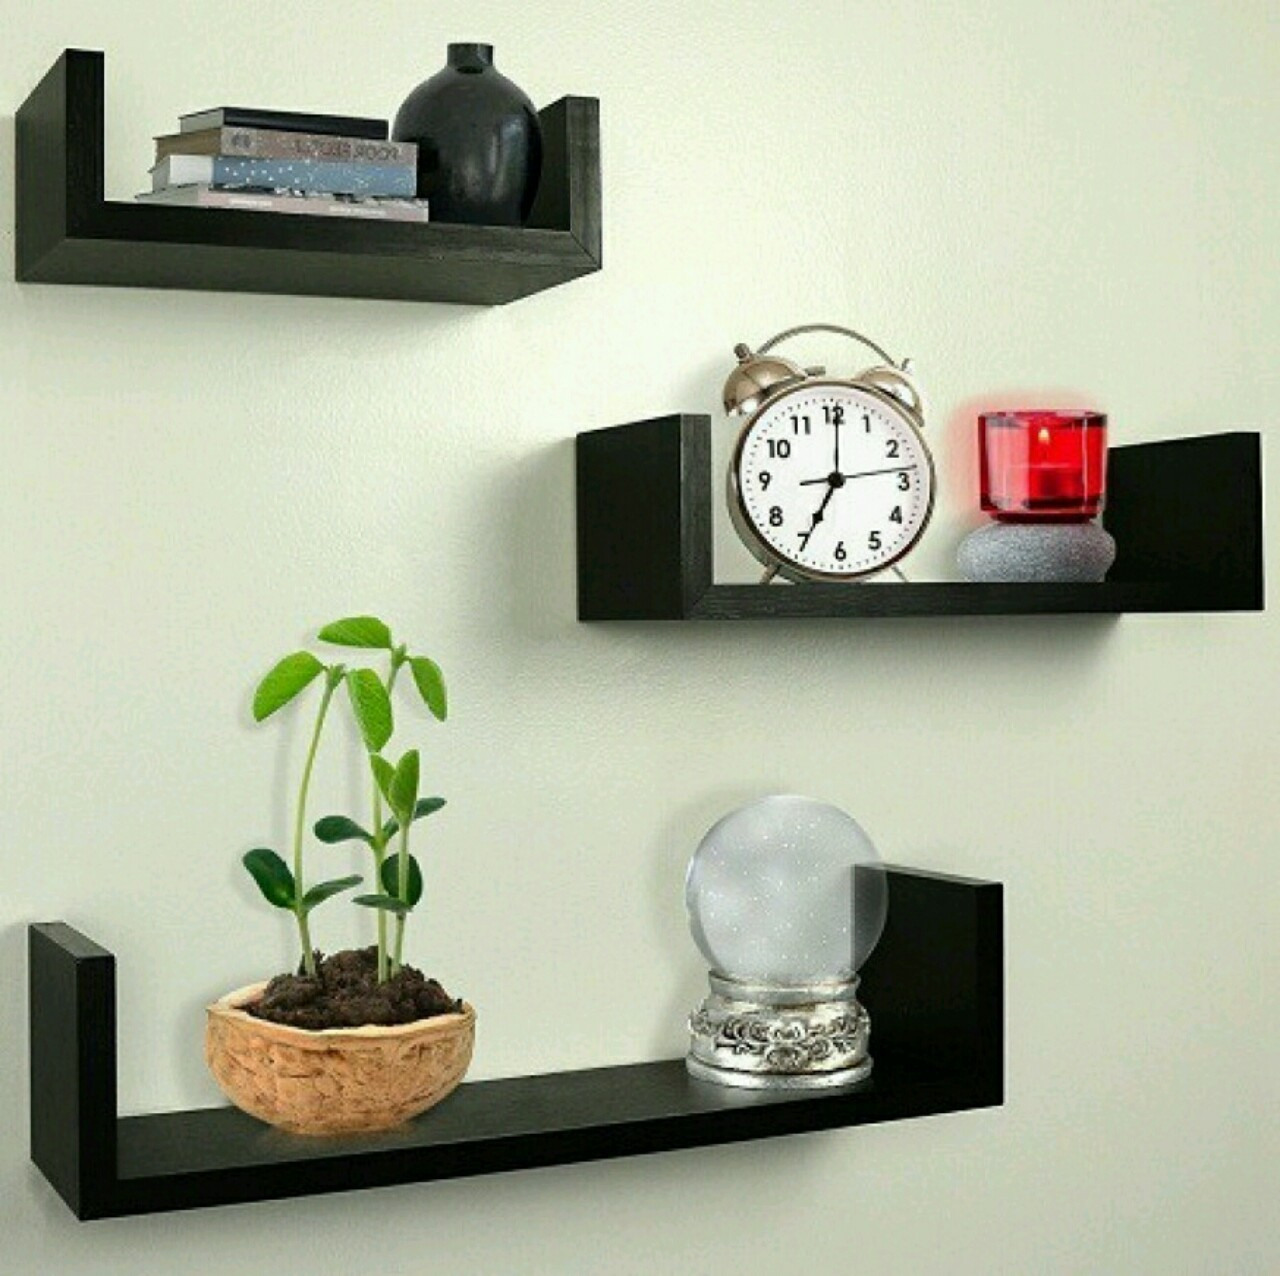 View Martcrown U wall shelf MDF Wall Shelf(Number of Shelves - 3, Black) Furniture (Martcrown)